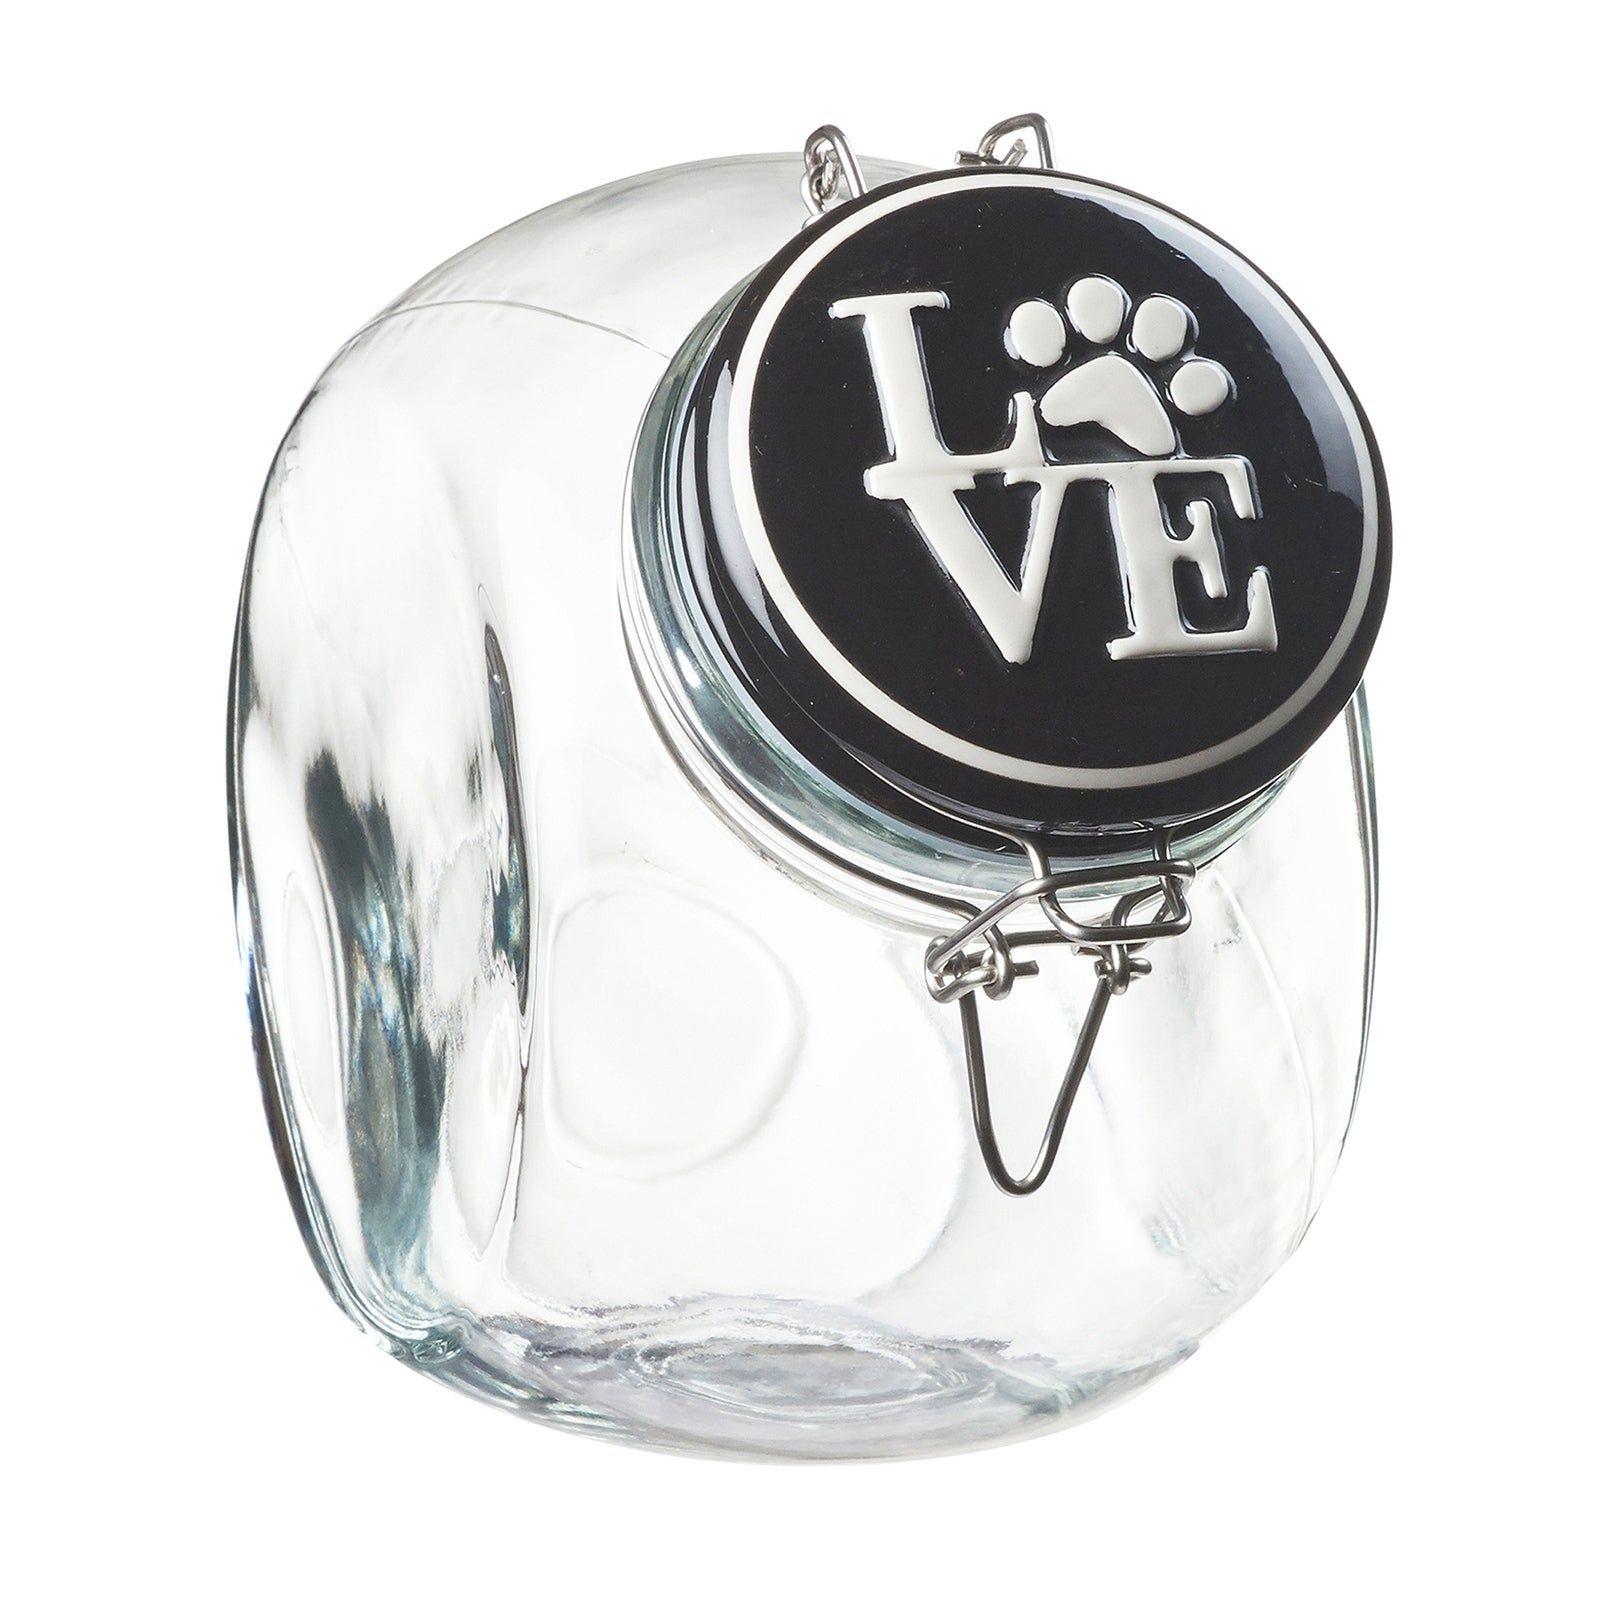 Online Shopping Bedding Furniture Electronics Jewelry Clothing More Stuffed Animal Storage Glass Storage Jars Dog Food Storage